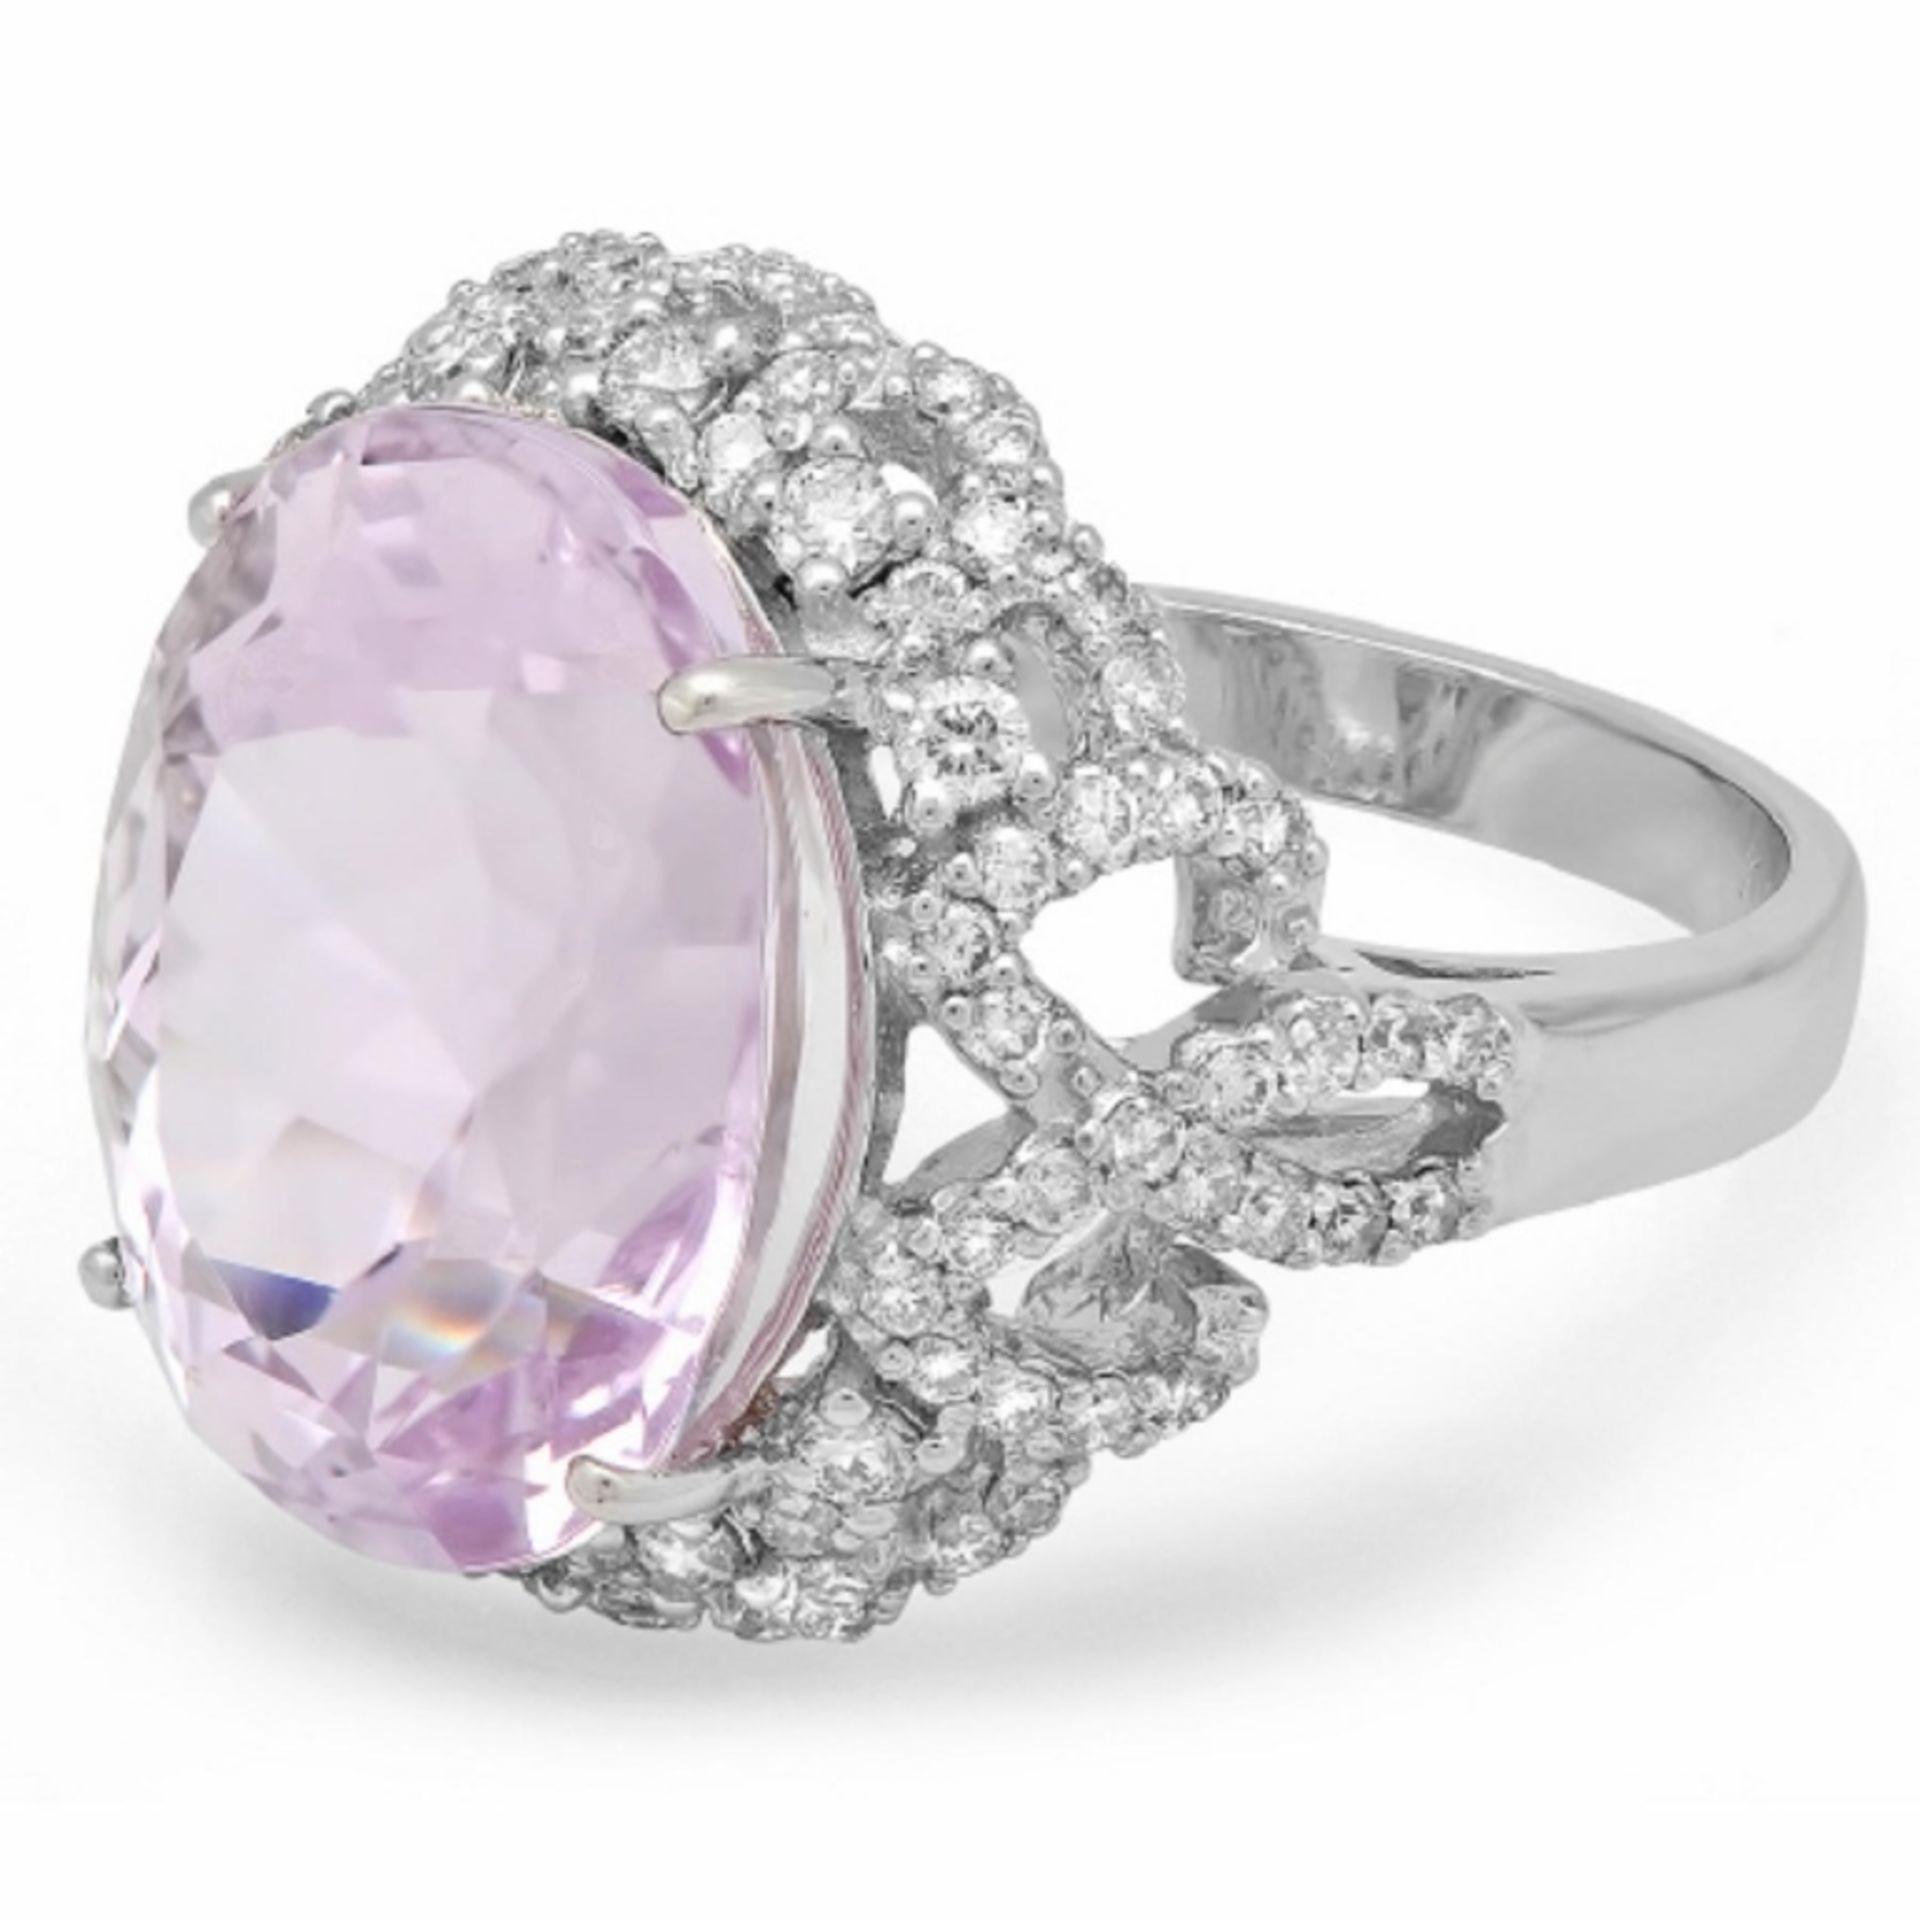 14K Gold 14.50ct Kunzite & 1.00ct Diamond Ring - Image 2 of 2